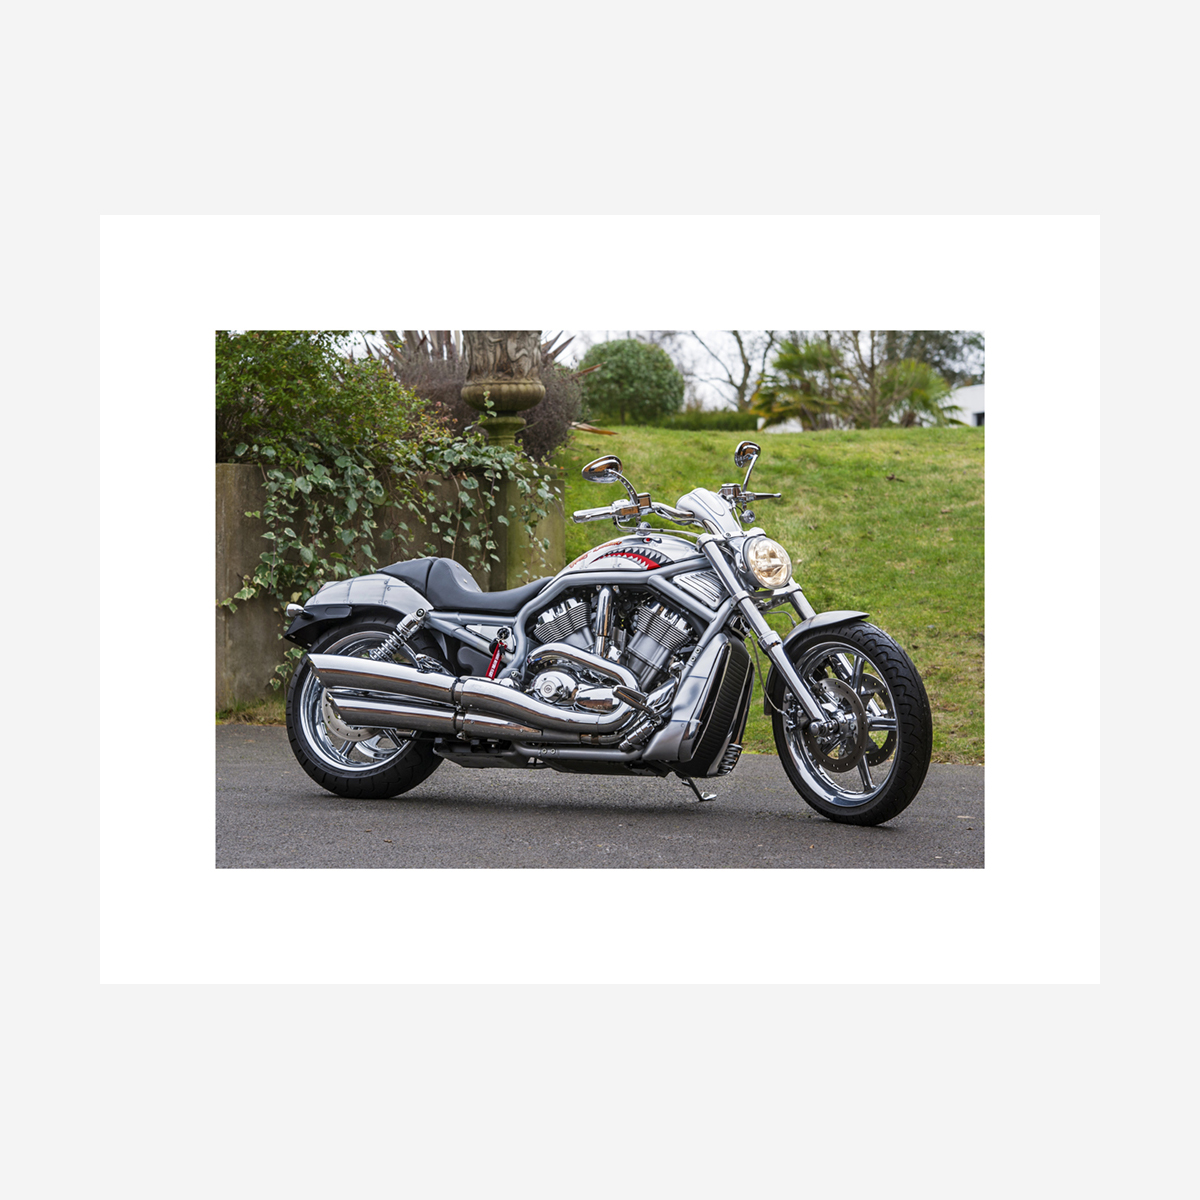 Harley Davidson V-Rod - 26x20.jpg